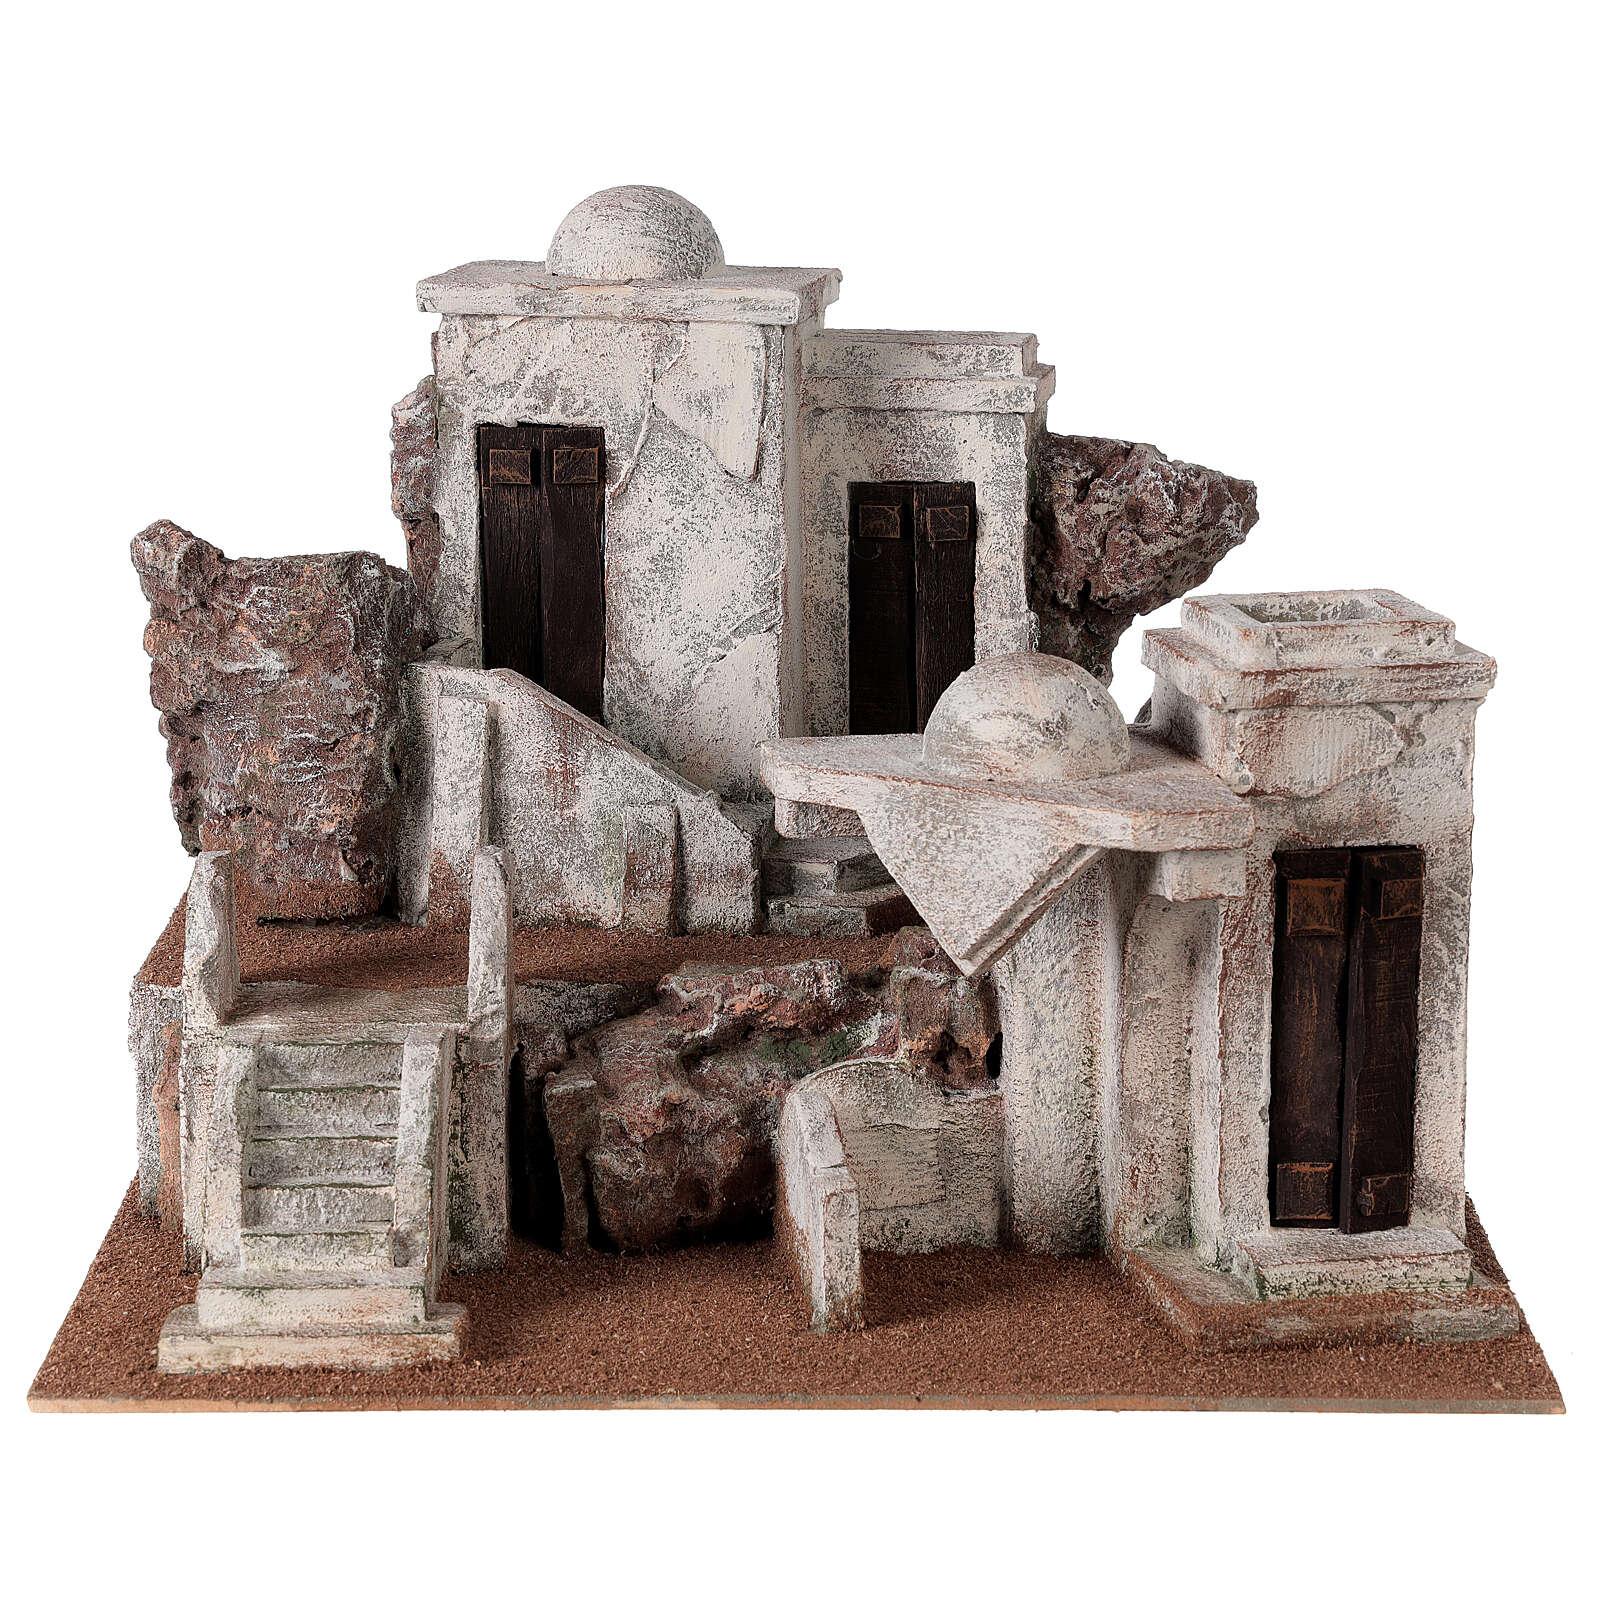 Traditional Nativity scene village 30x40x35 cm for statues 10 cm 4